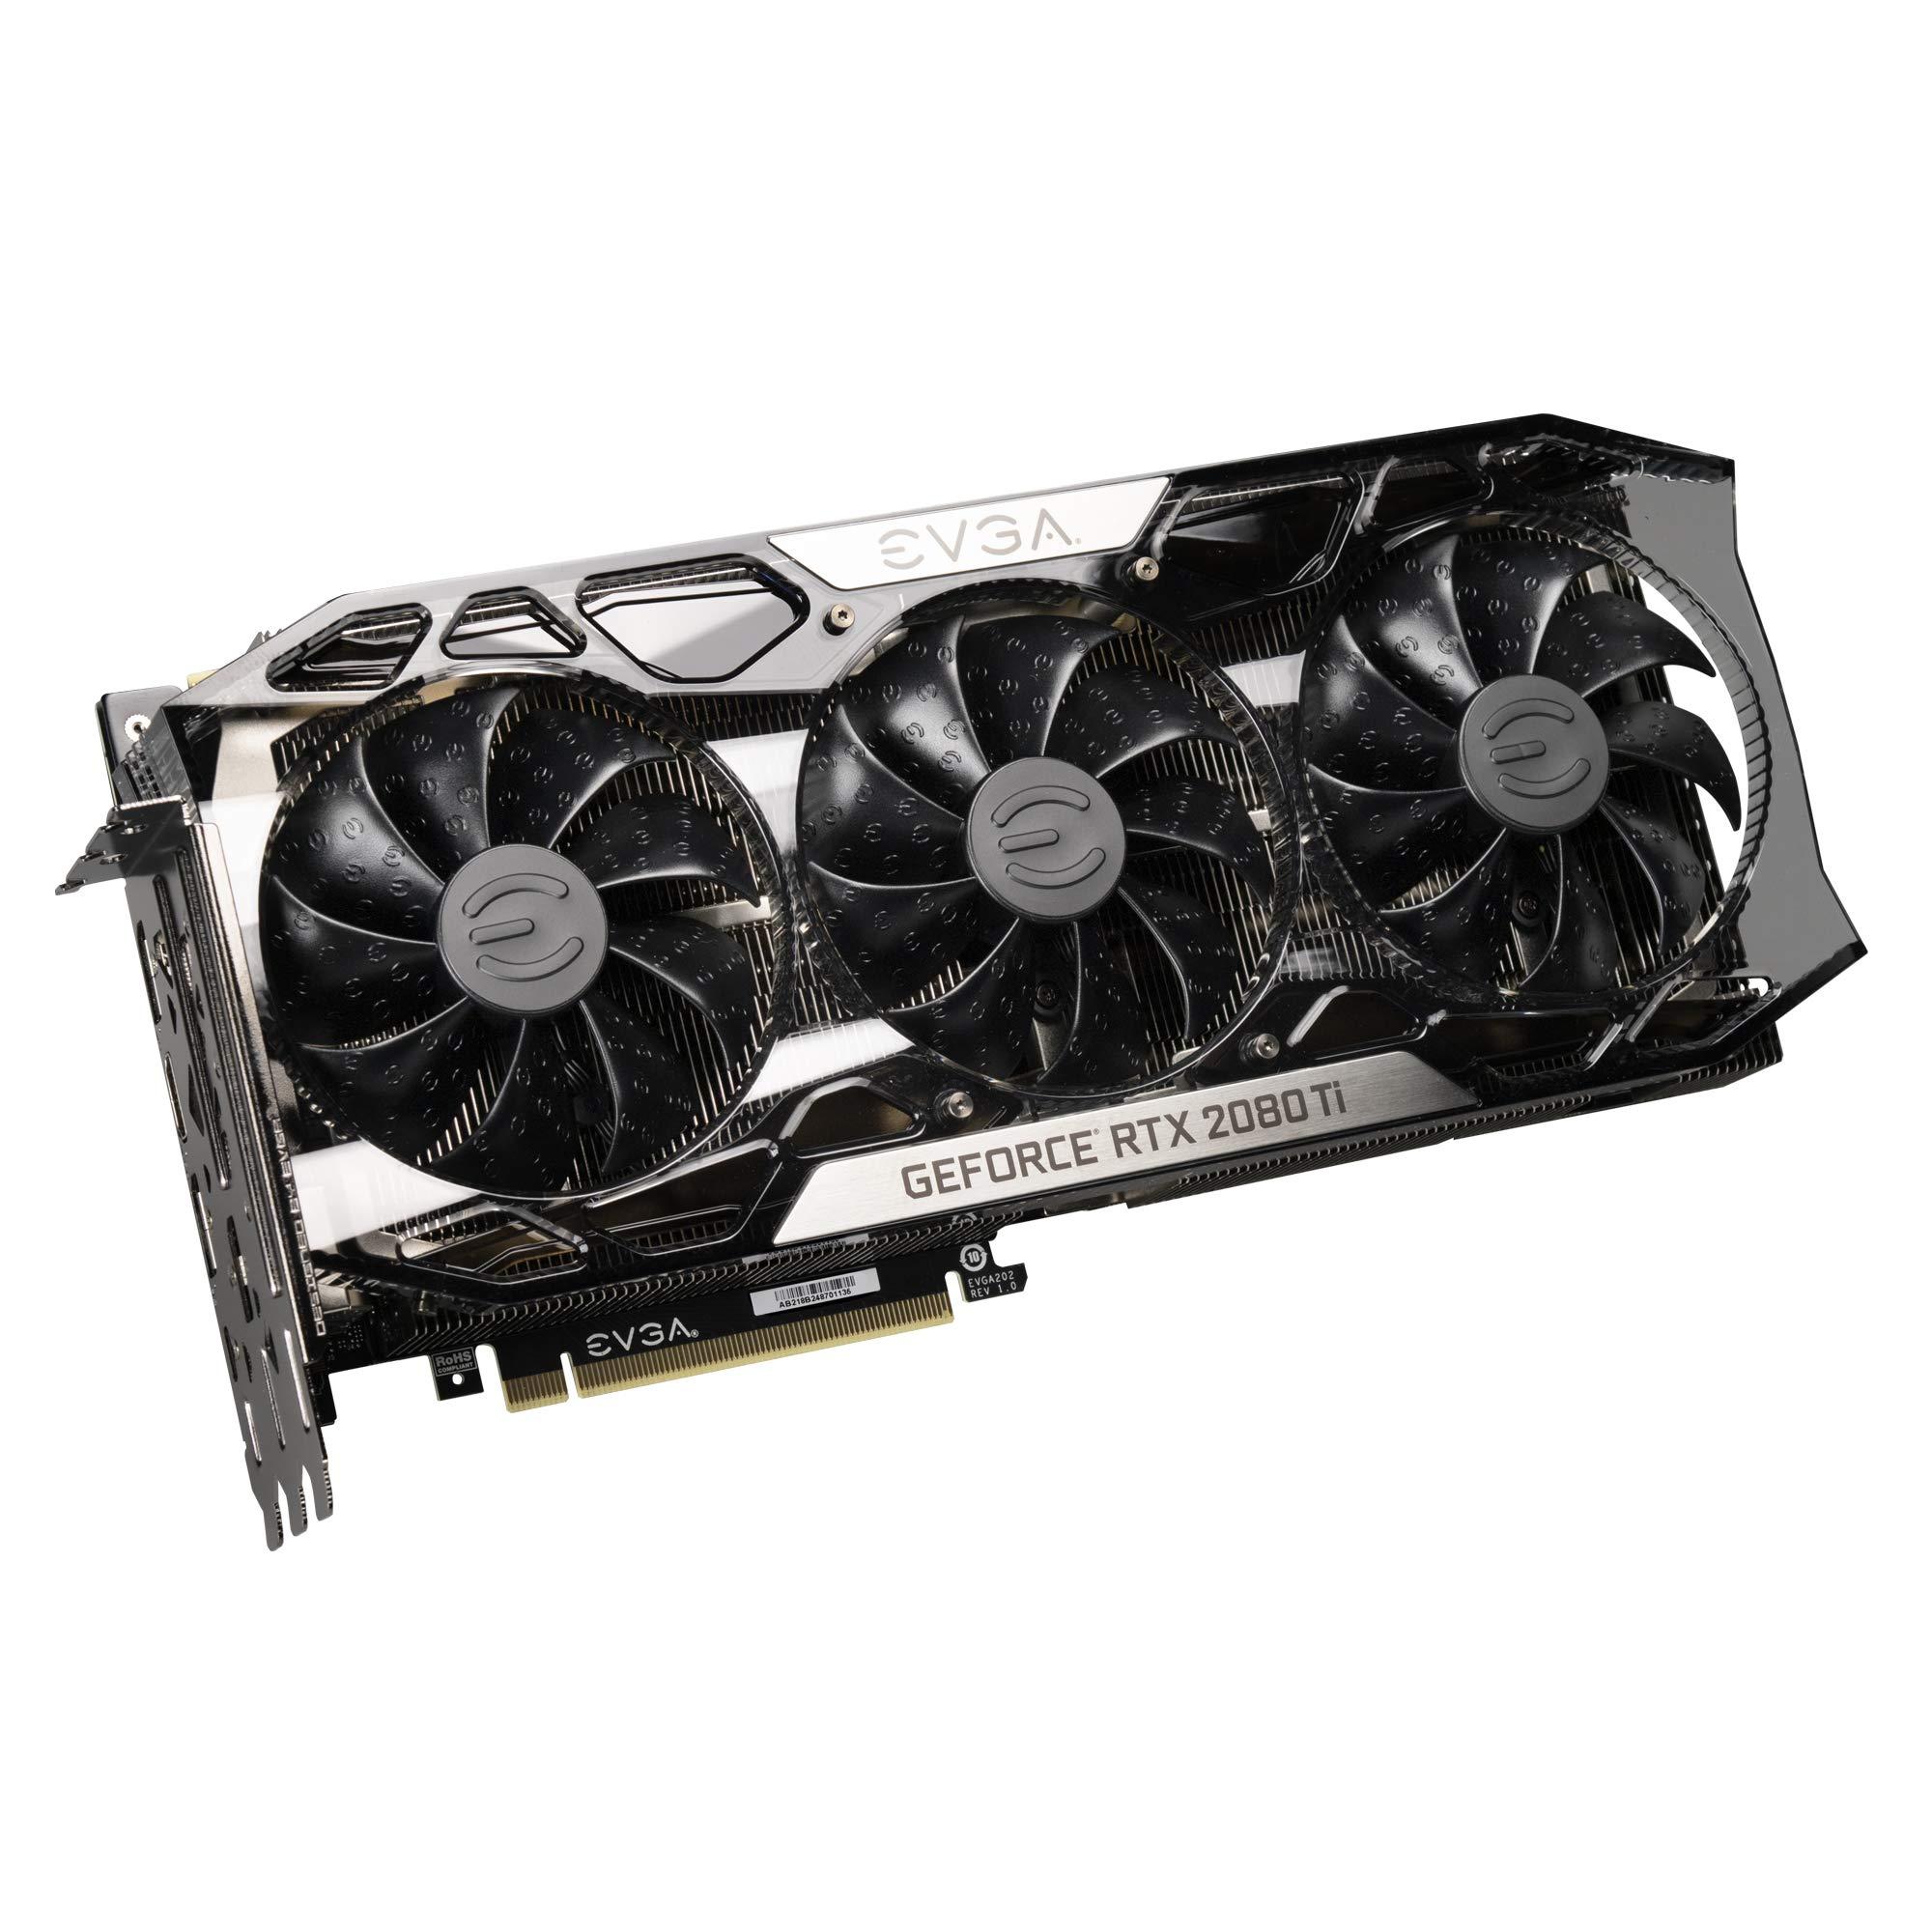 EVGA GeForce RTX 2080 Ti FTW3 Ultra Gaming, 11GB GDDR6, iCX2 & RGB LED Graphics Card 11G-P4-2487-KR by EVGA (Image #4)